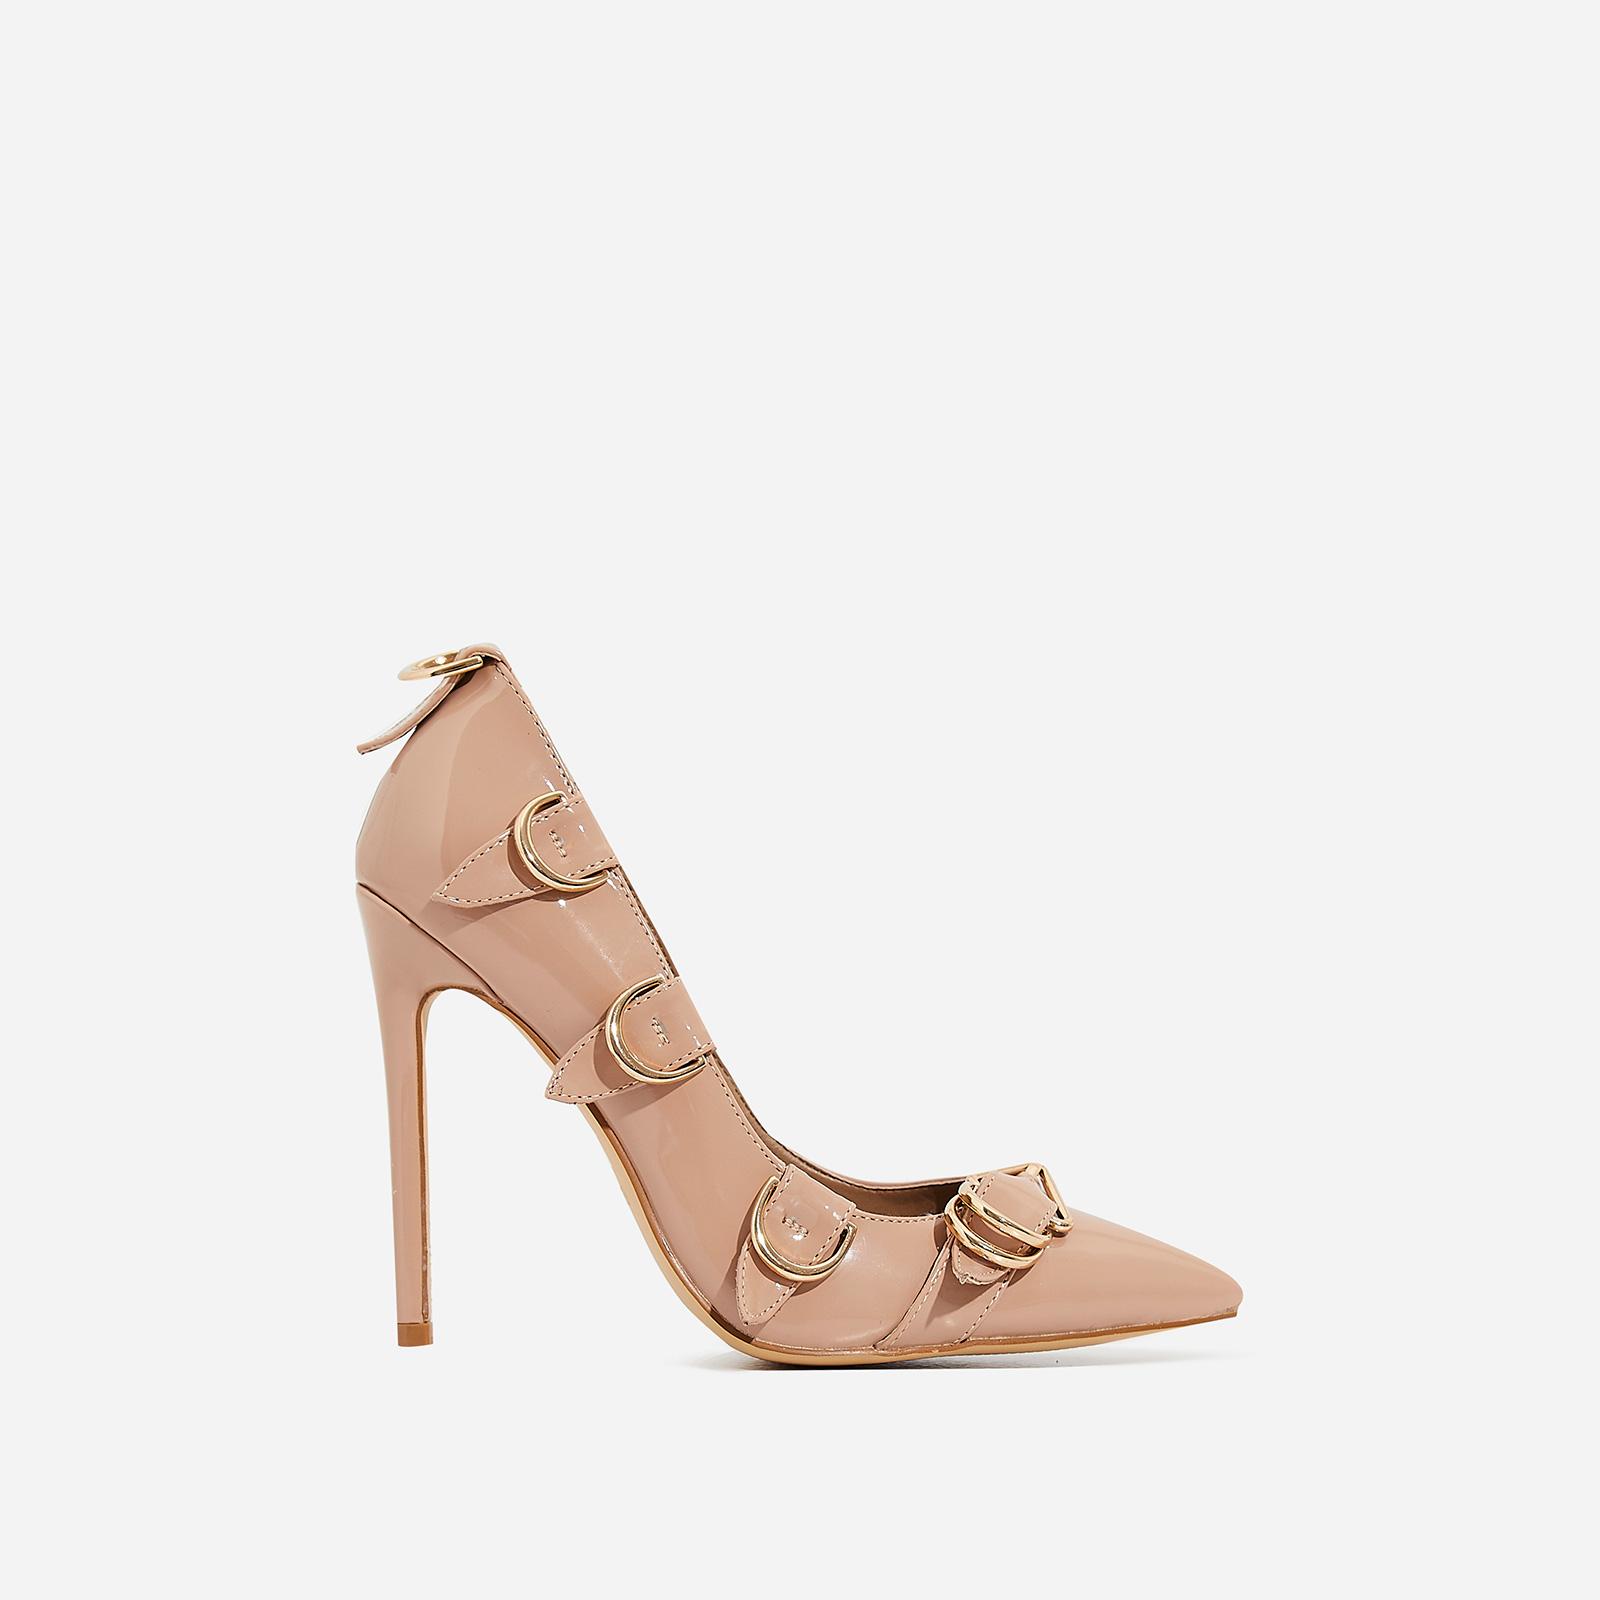 fe55edc577f5 Aleko Buckle Detail Court Heel In Nude Patent